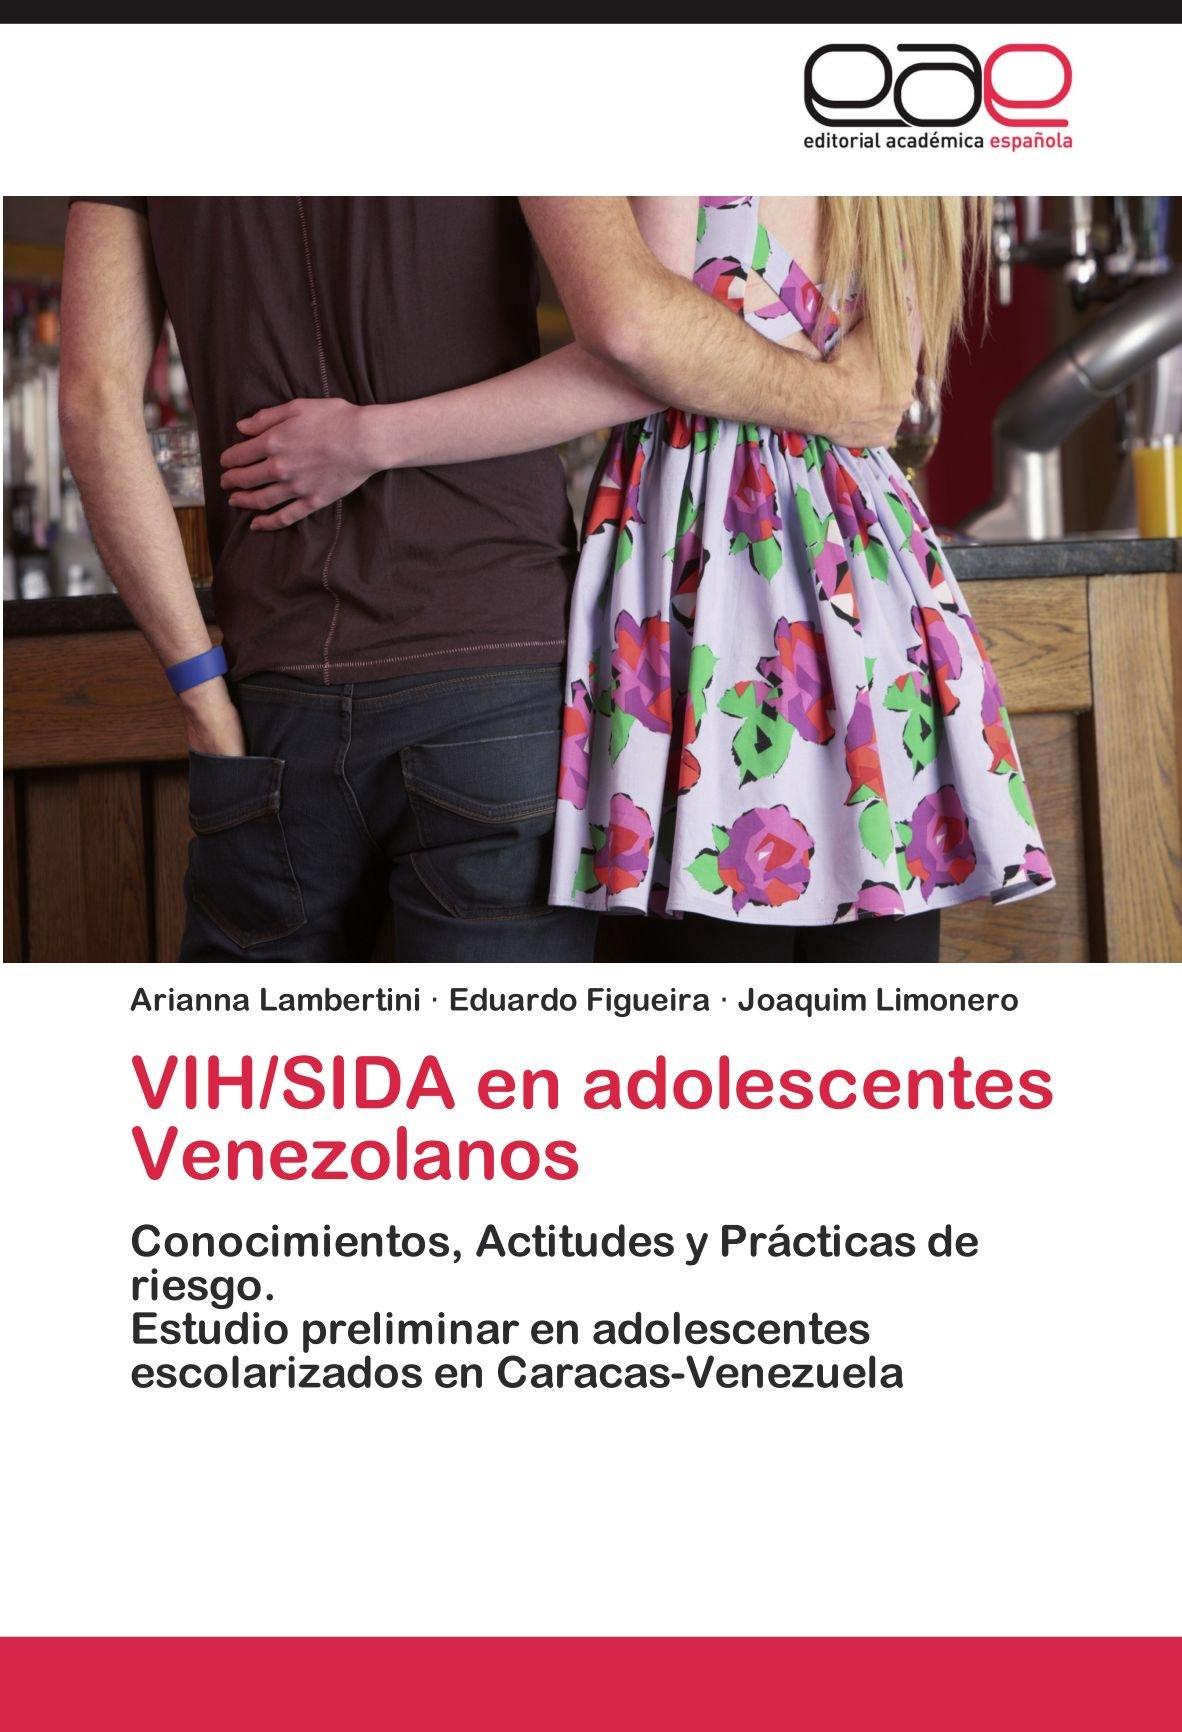 VIH/SIDA en adolescentes Venezolanos: Amazon.es: Lambertini Arianna, Figueira Eduardo, Limonero Joaquim: Libros